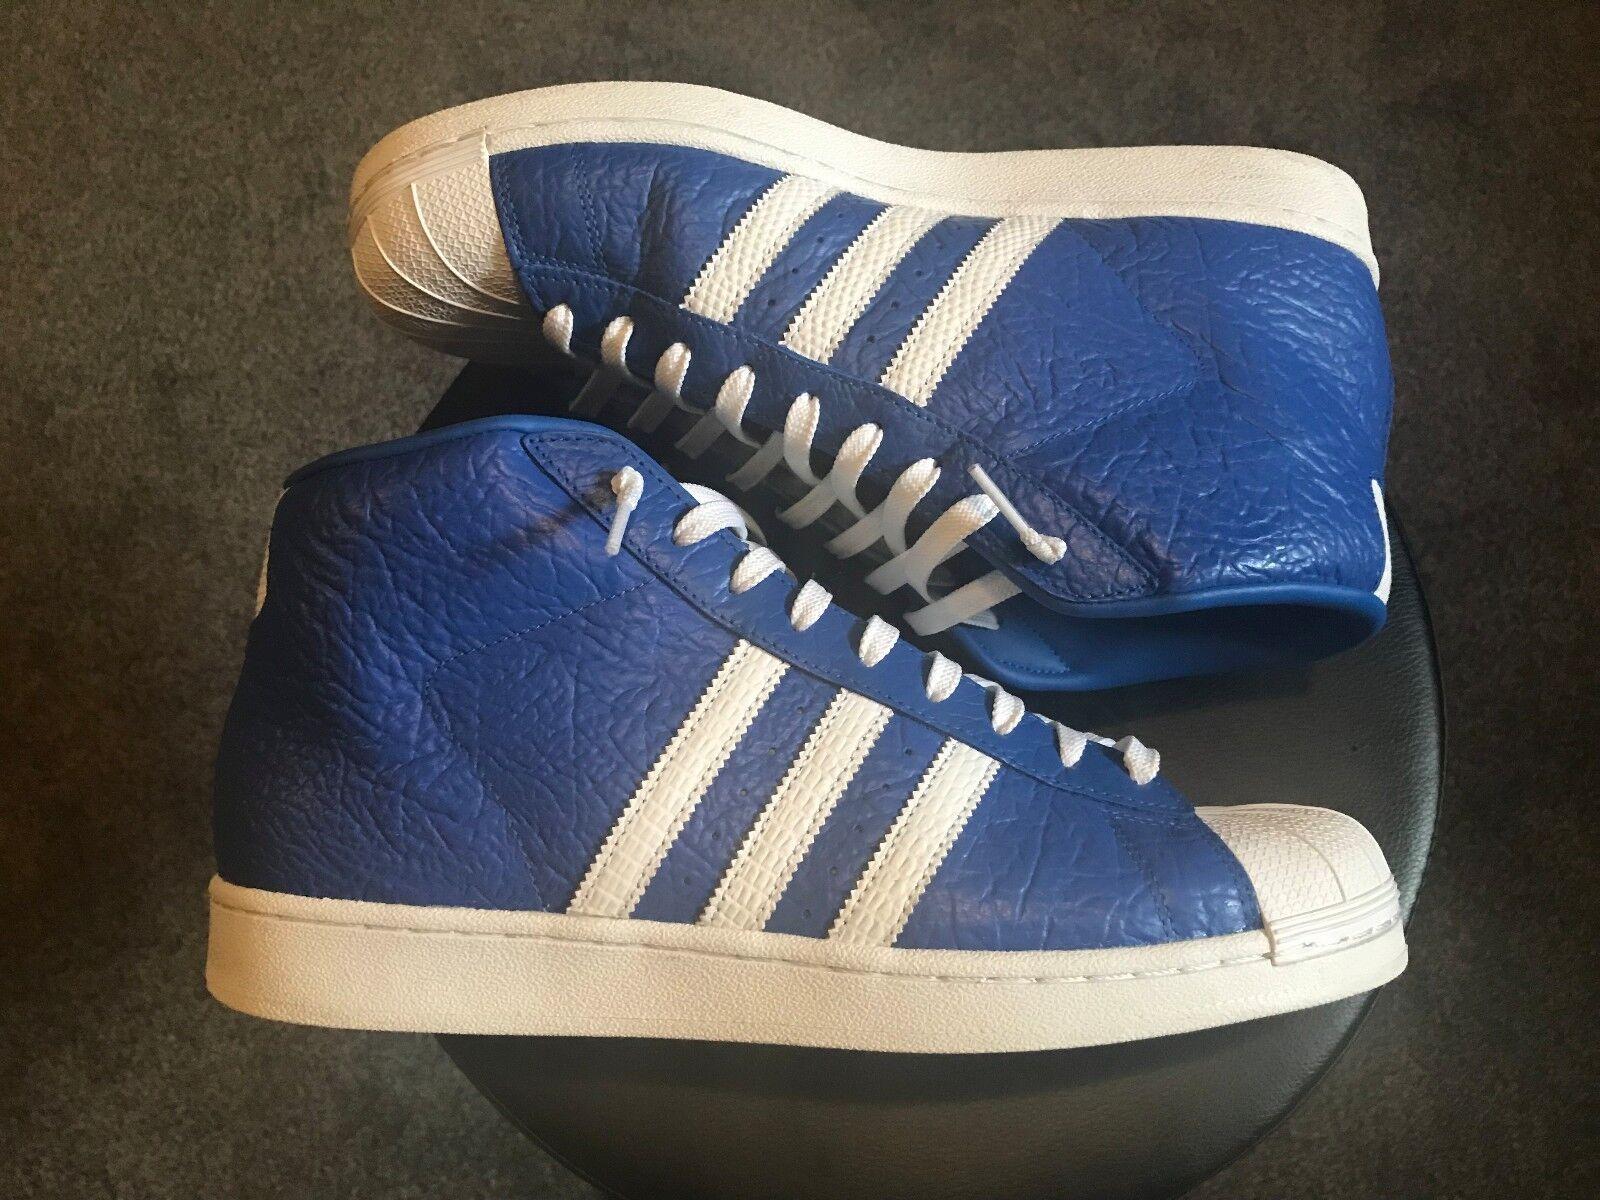 Hombres Adidas high top zapatillas dodger Superstar shelltoe animal azul dodger zapatillas la 11.0 d7ab74